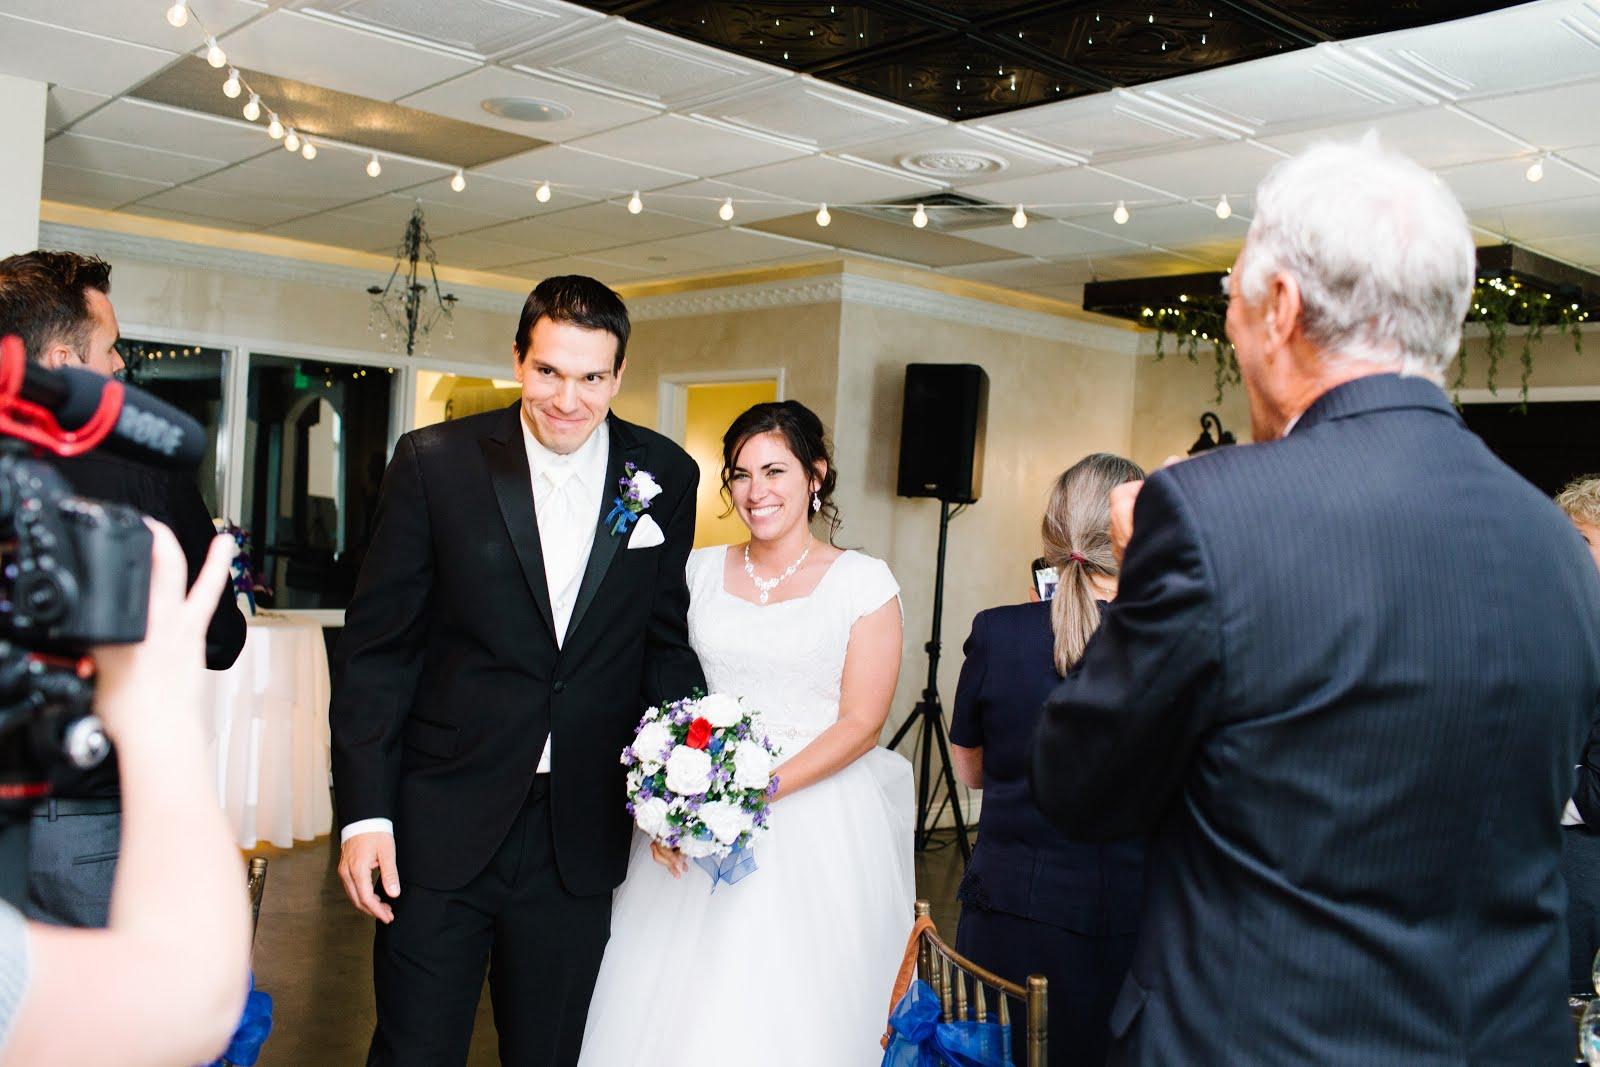 The Running Mormon My Stargazing Themed Wedding